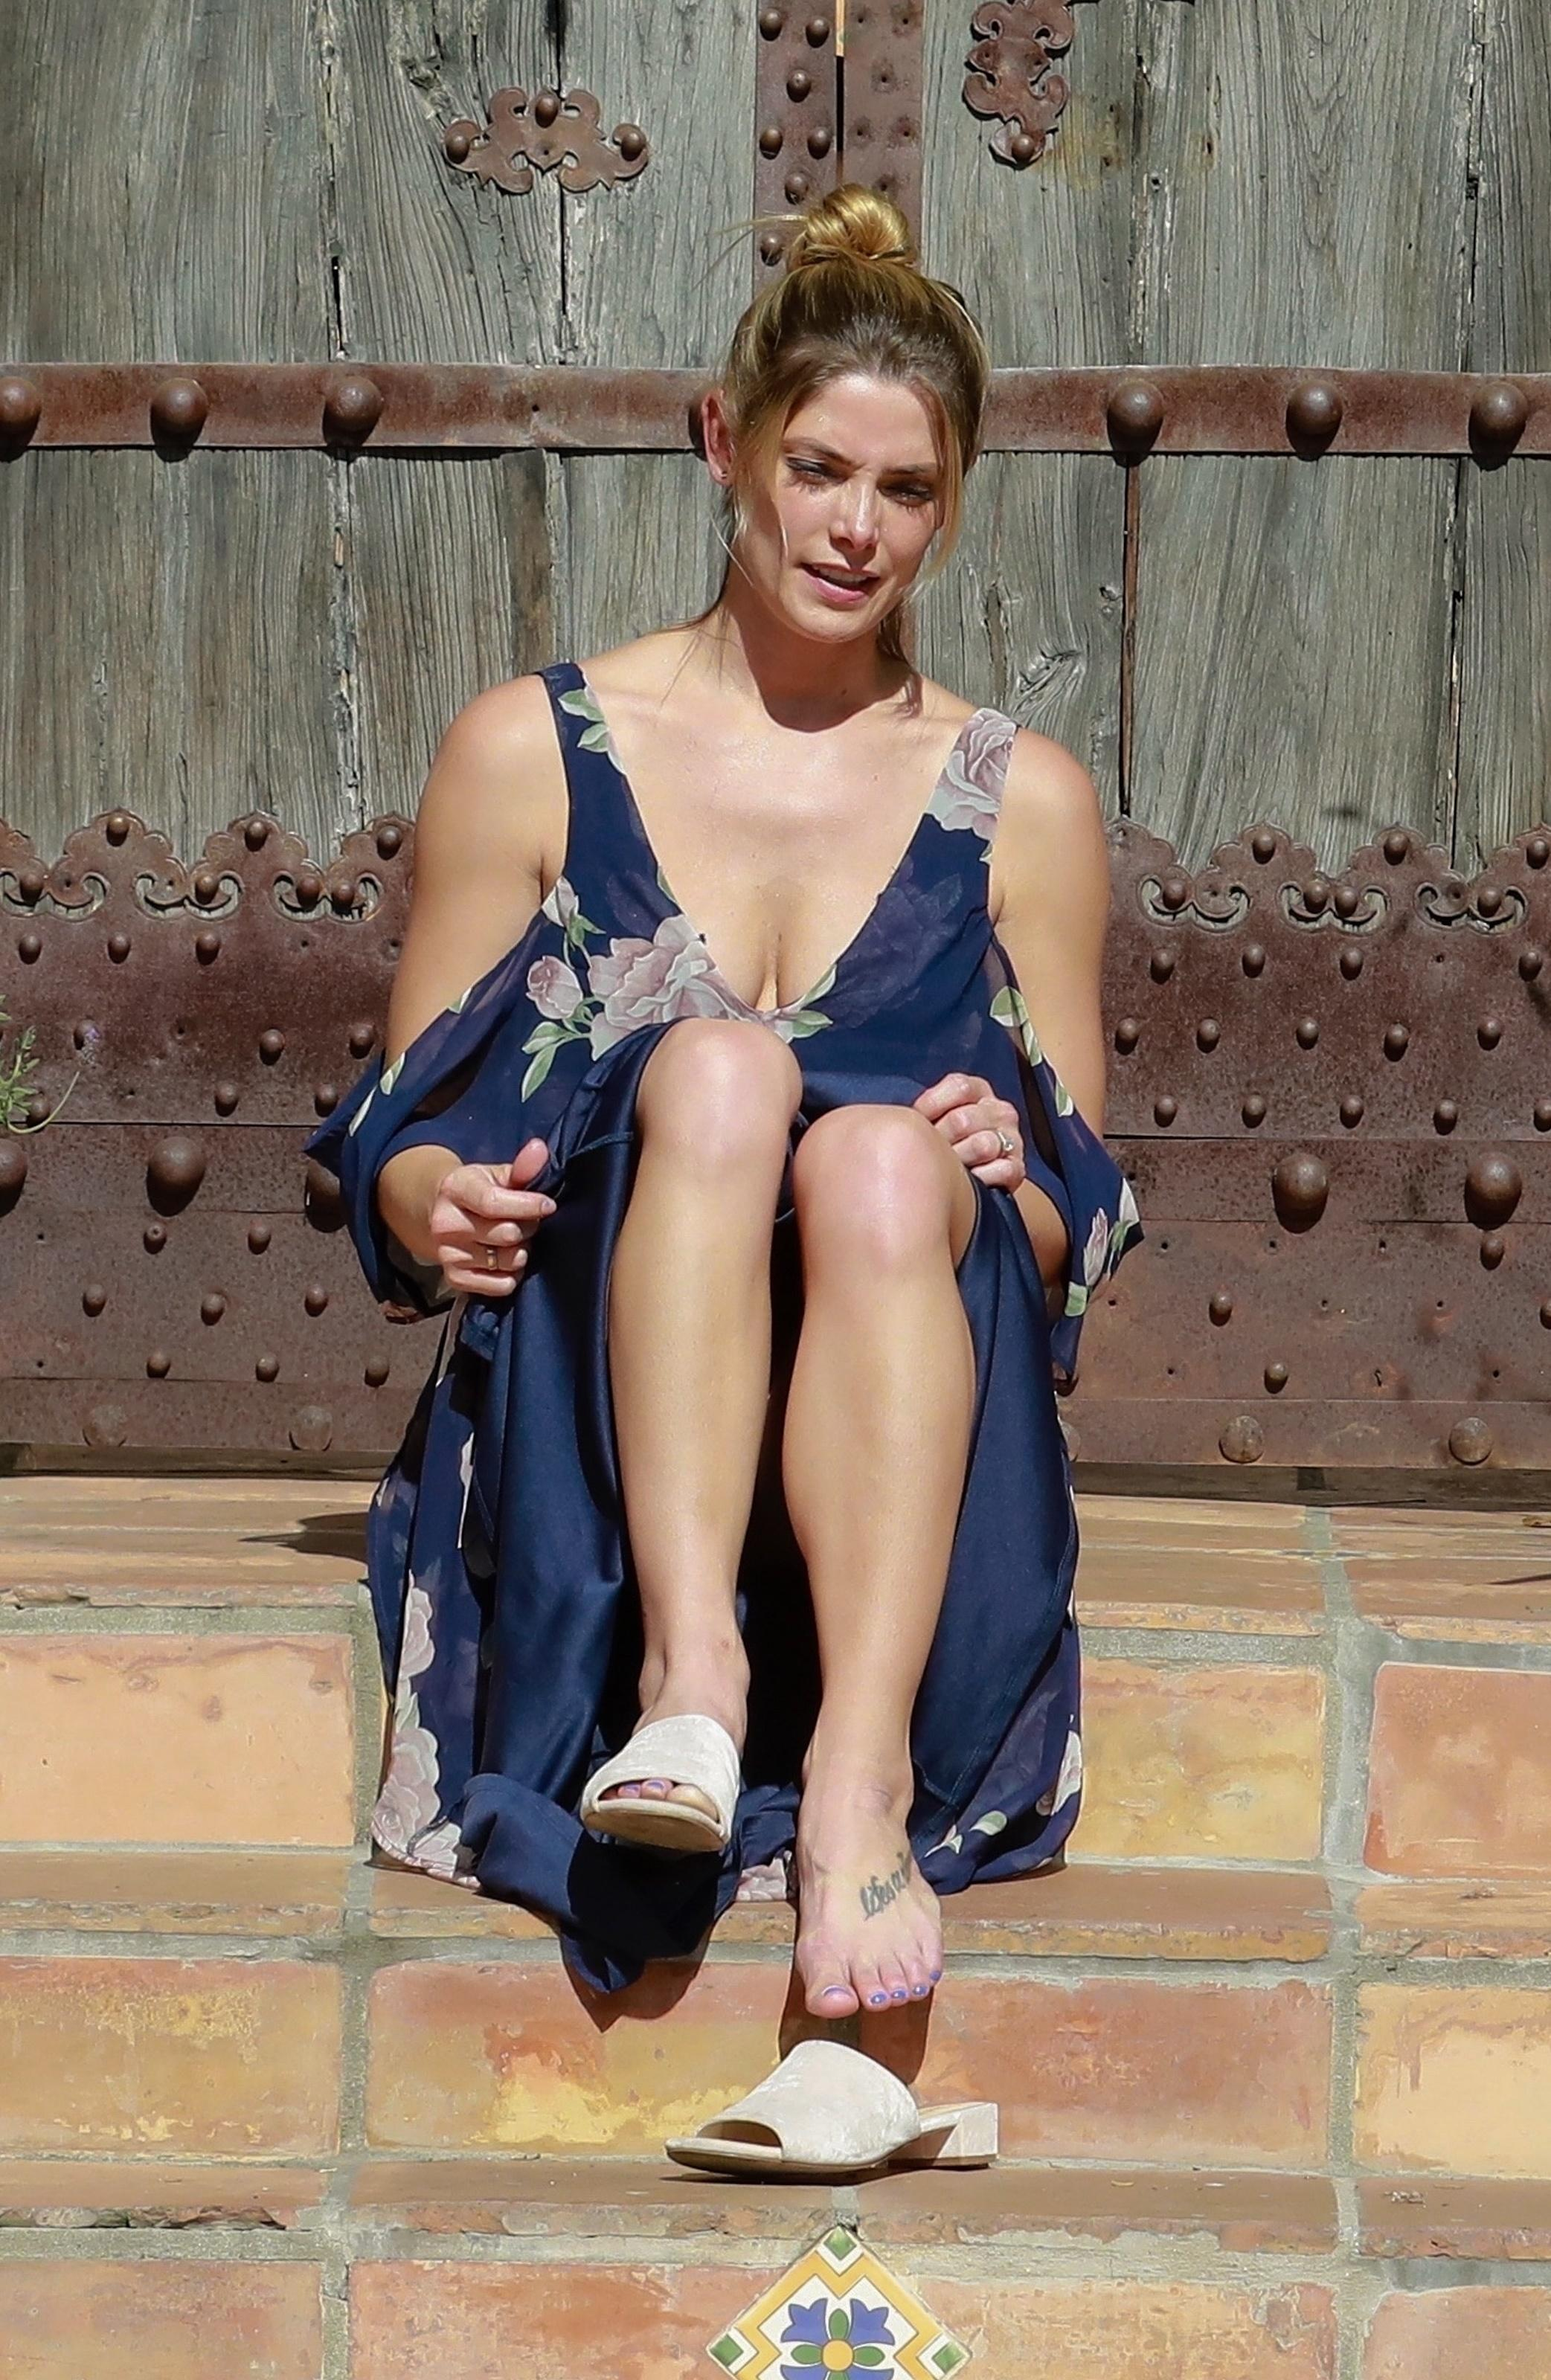 Feet Ashley Greene nude photos 2019